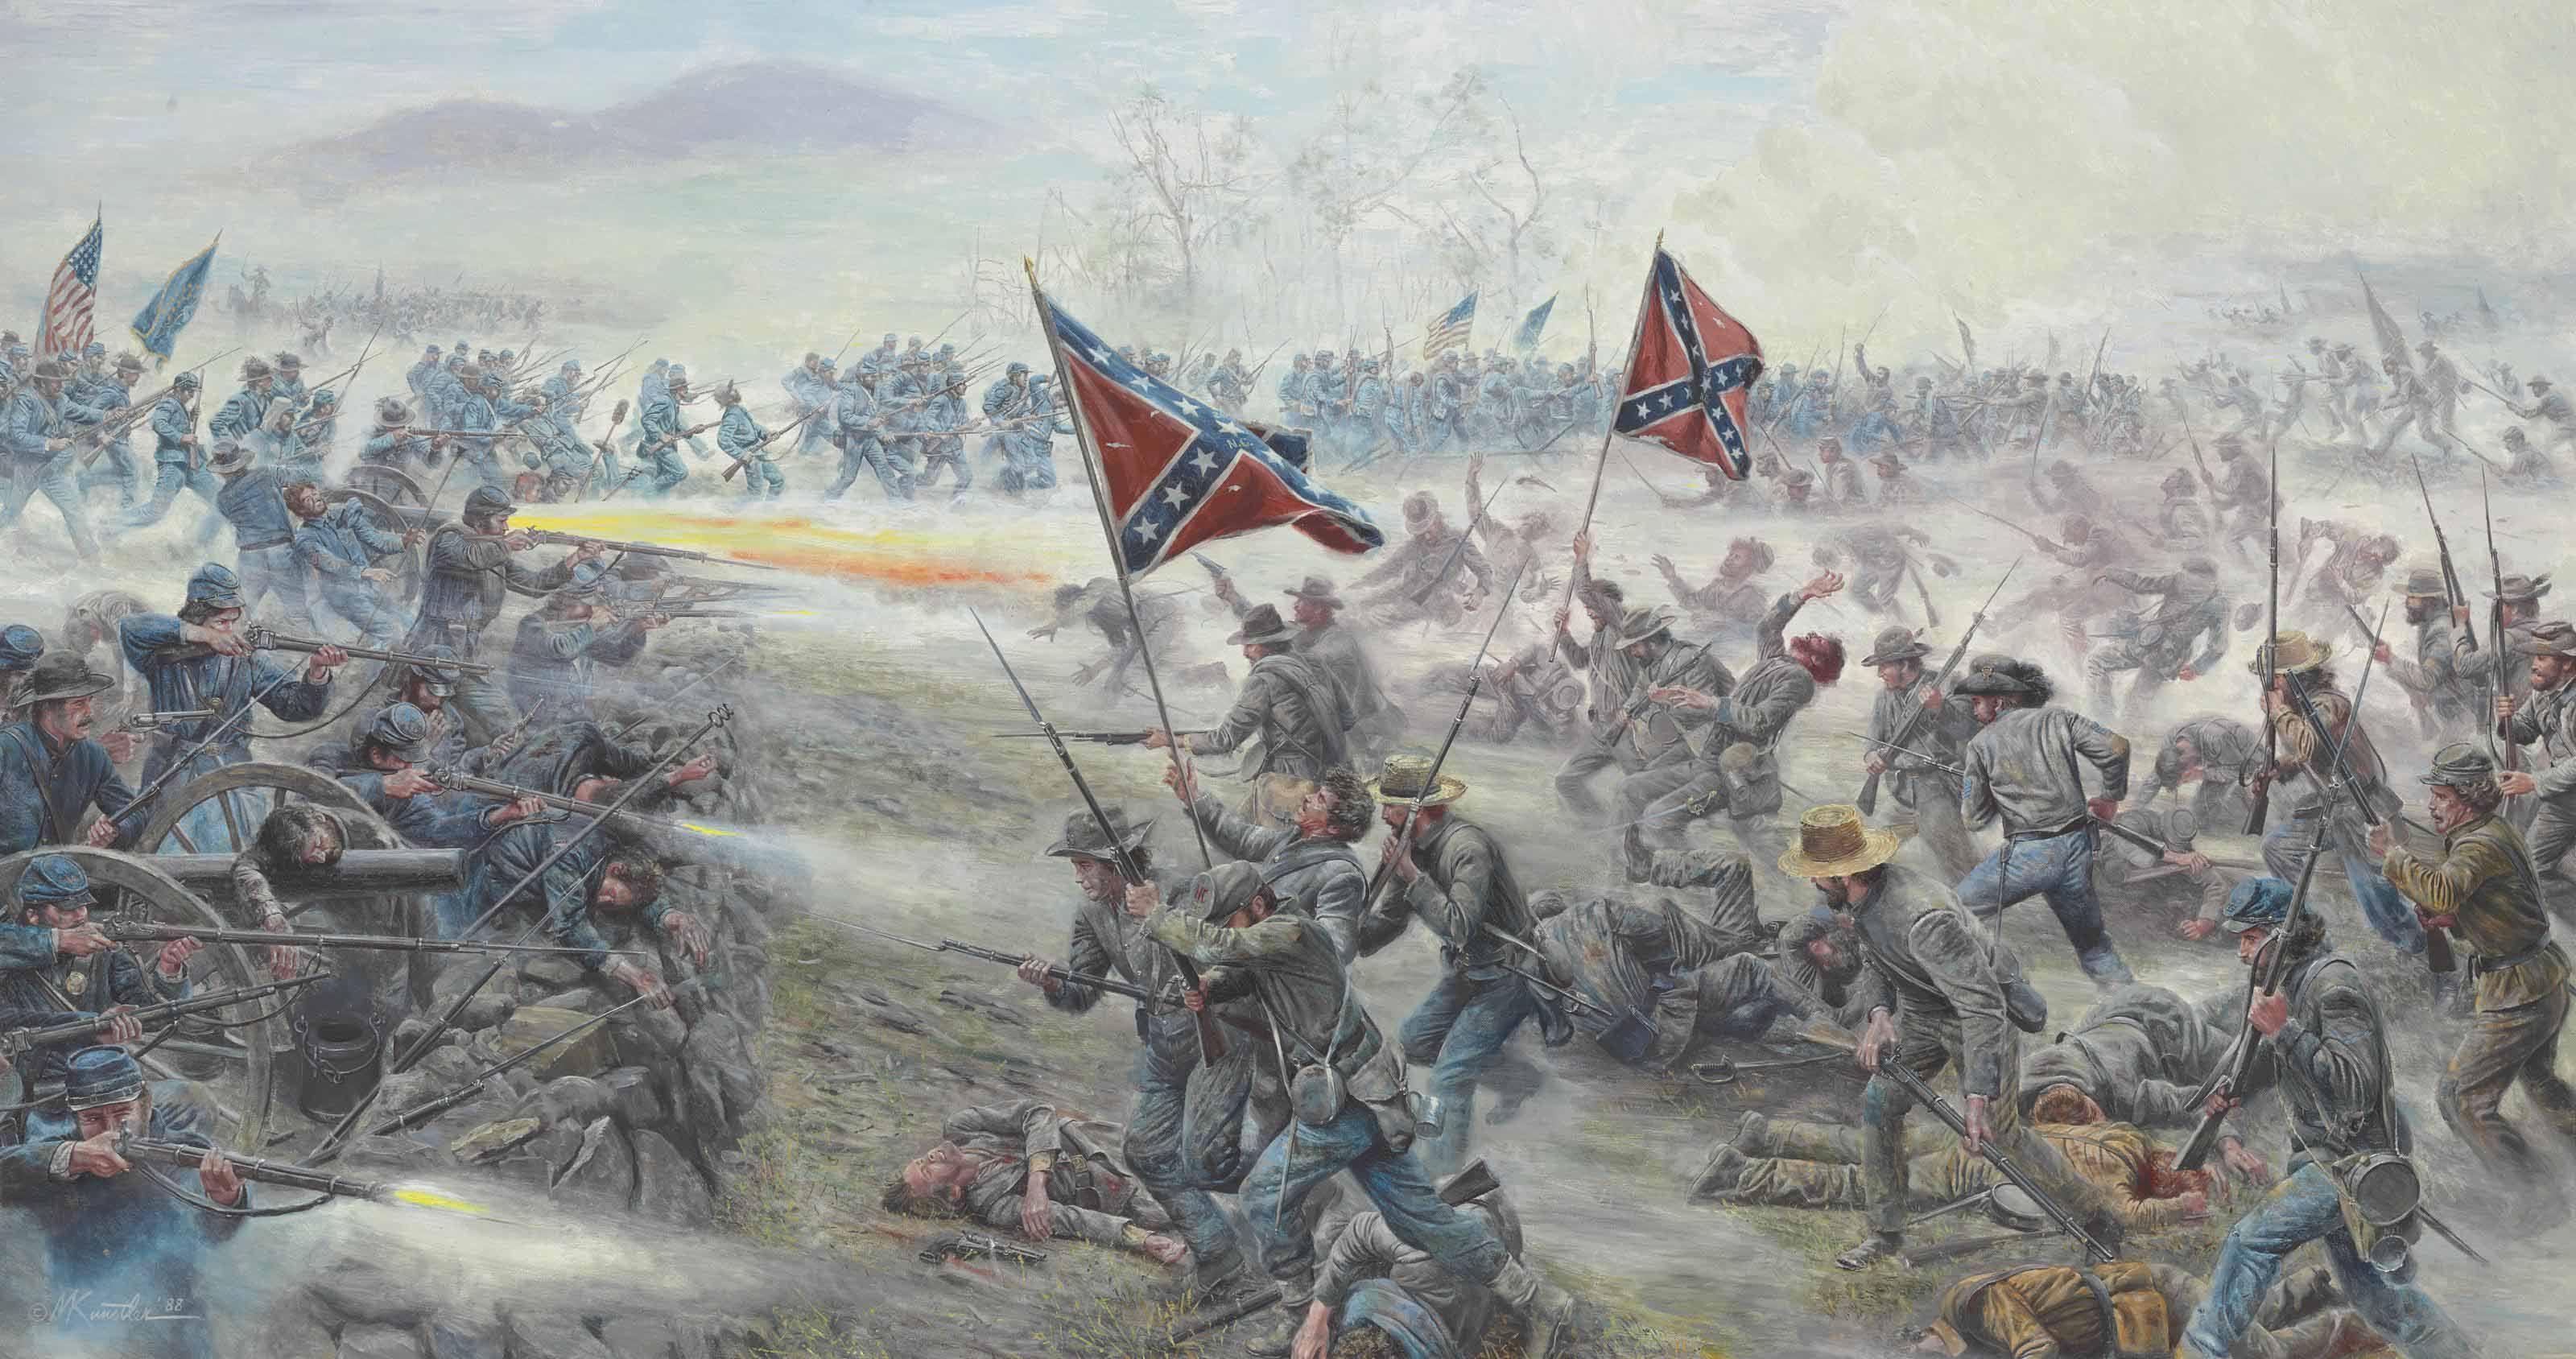 Pin by Aidan on Civil War | Civil war art, Gettysburg